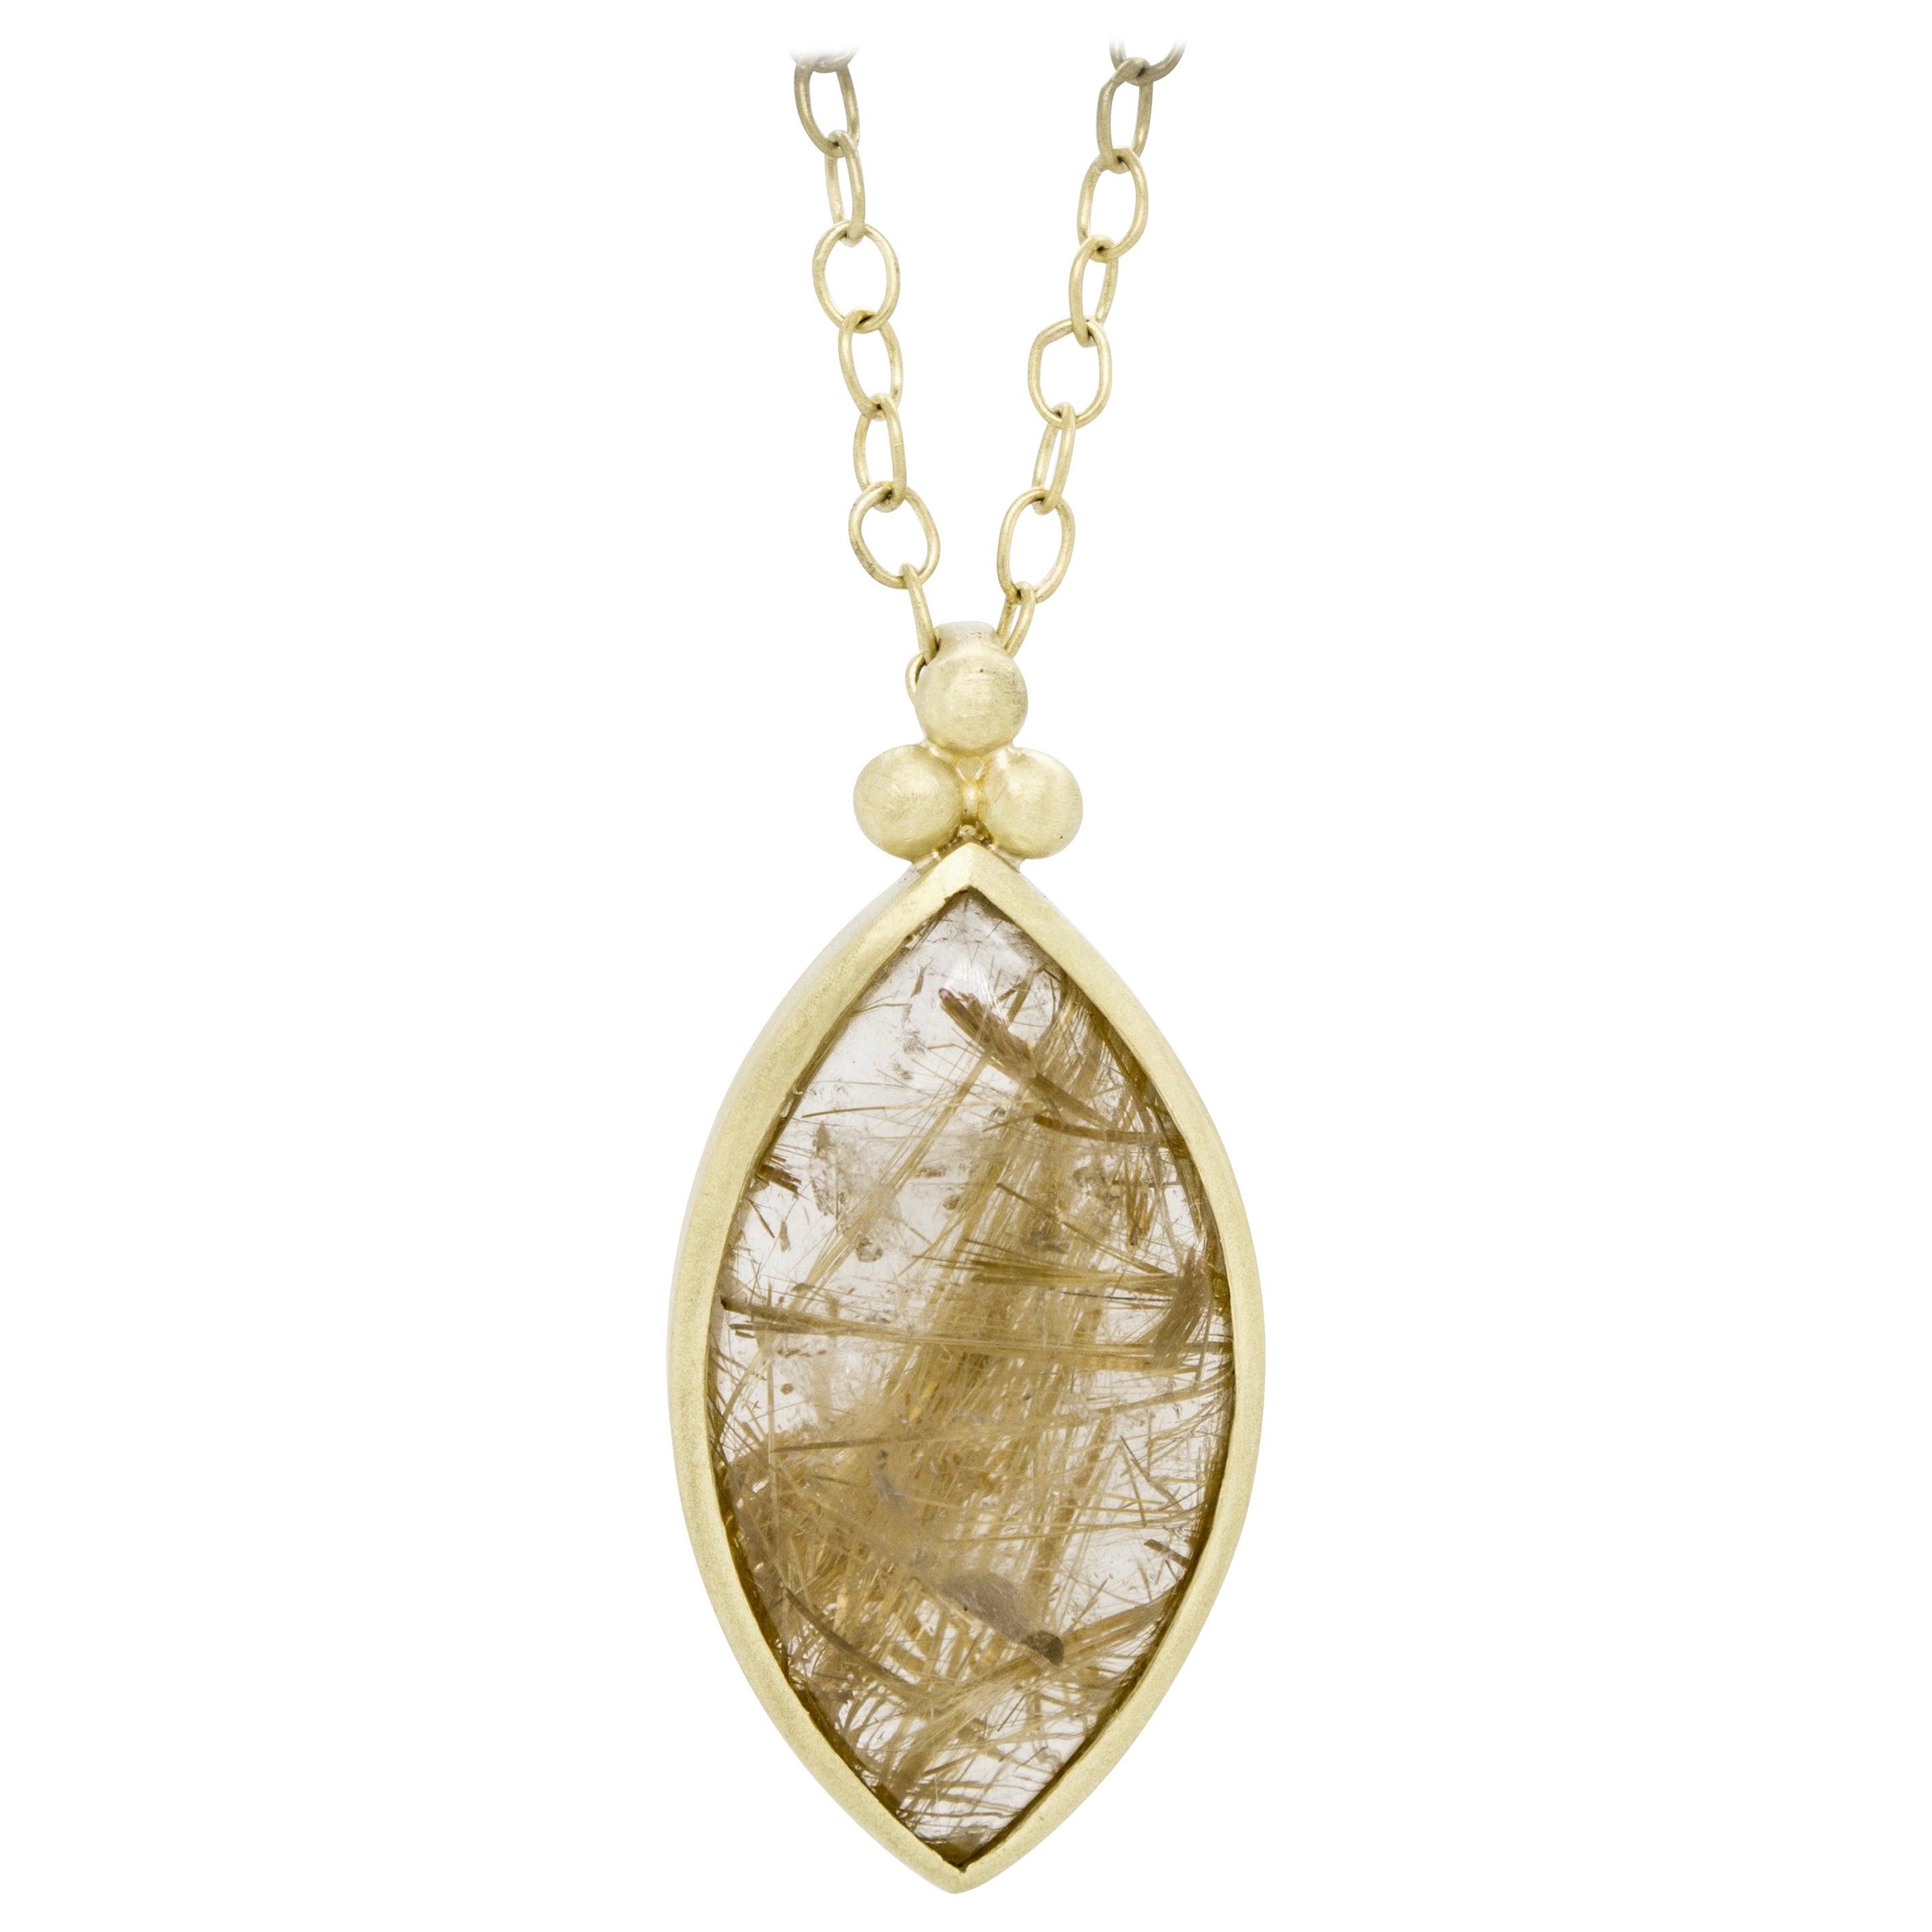 Faye Kim 18 Karat Gold Rutilated Quartz Pendant Necklace